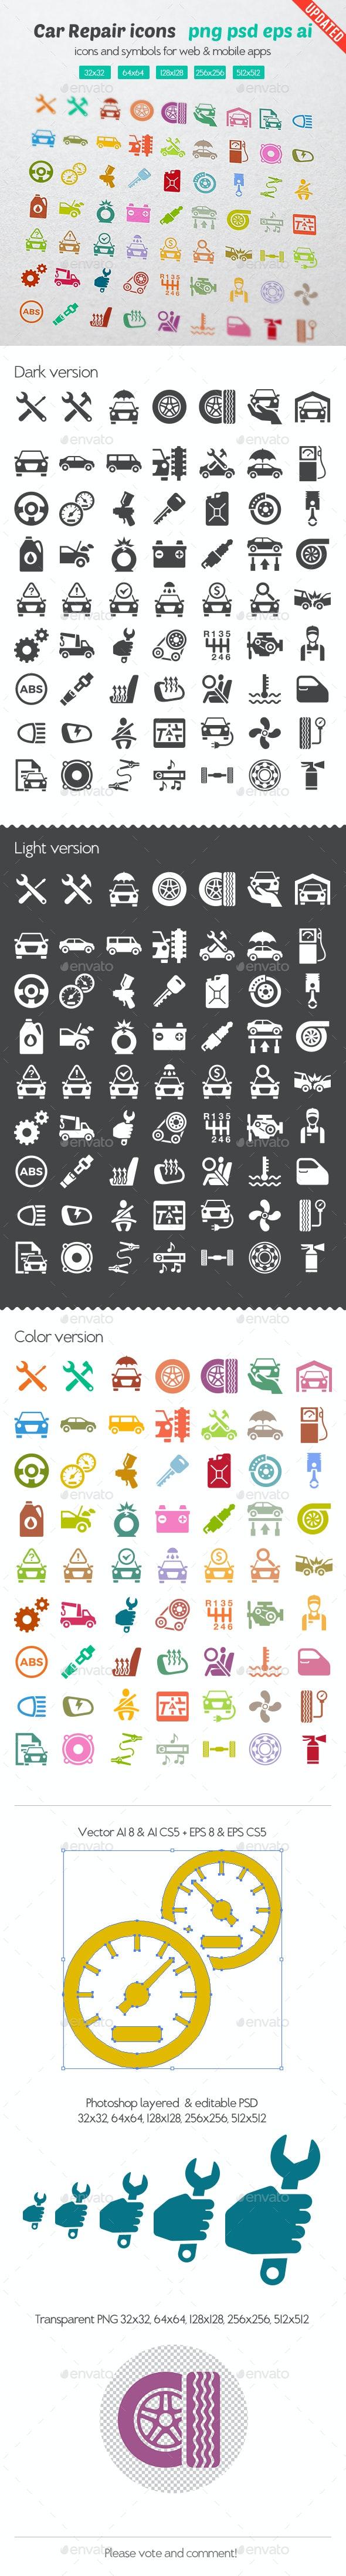 Car Repair Icons - Icons